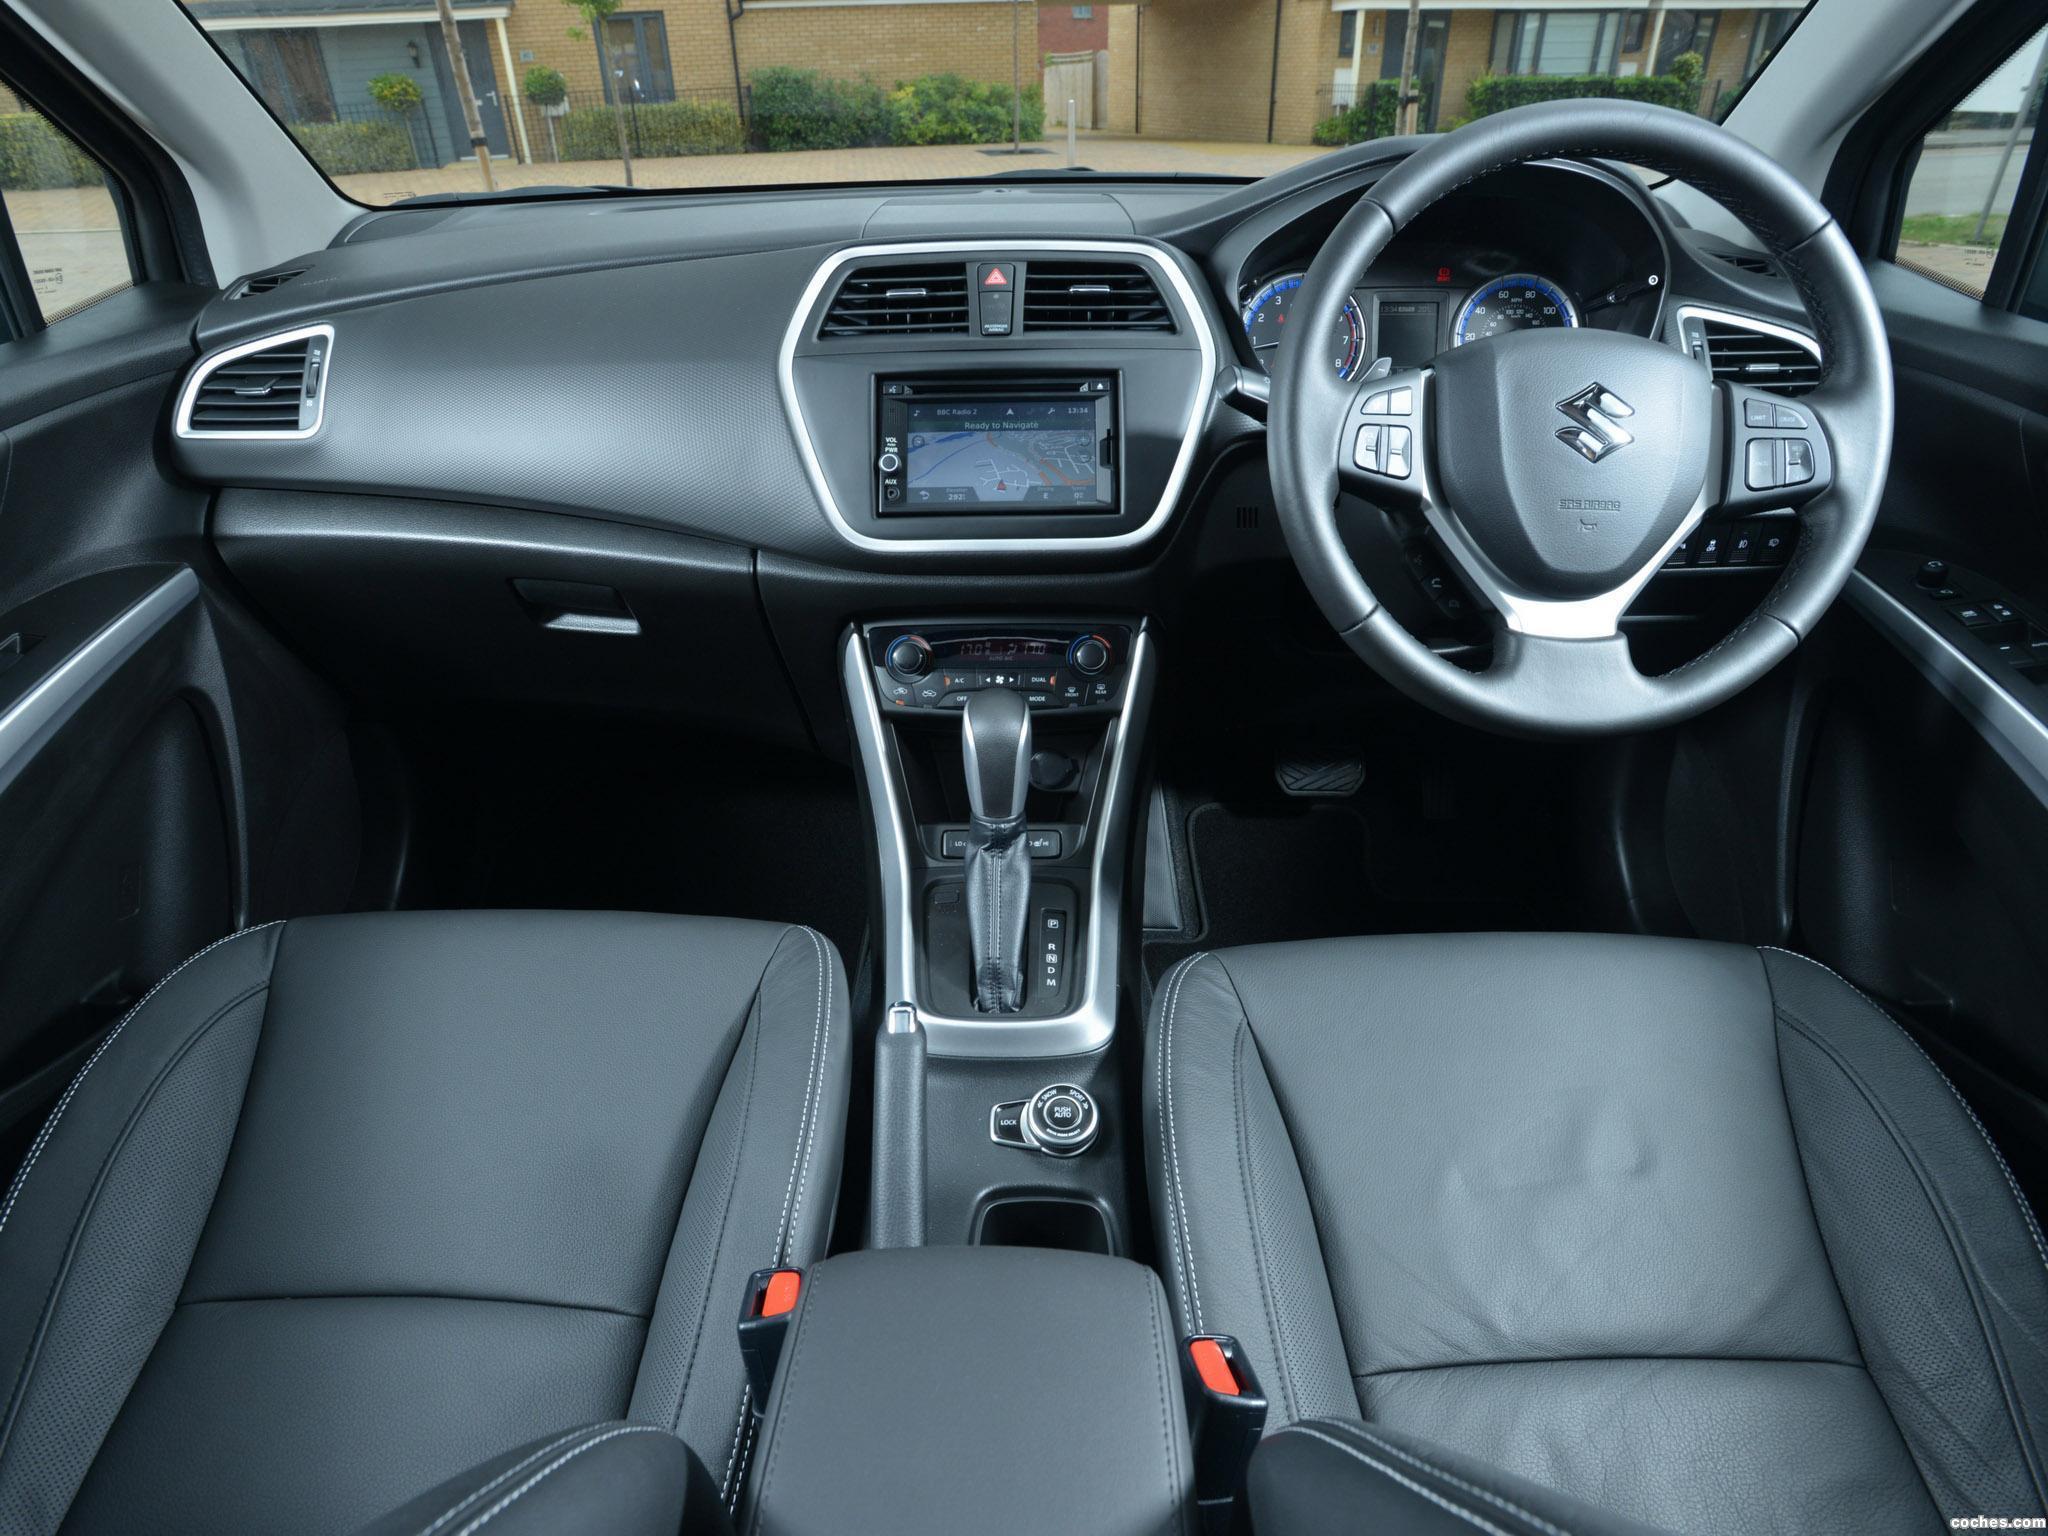 Foto 11 de Suzuki SX4 S-Cross UK 2013